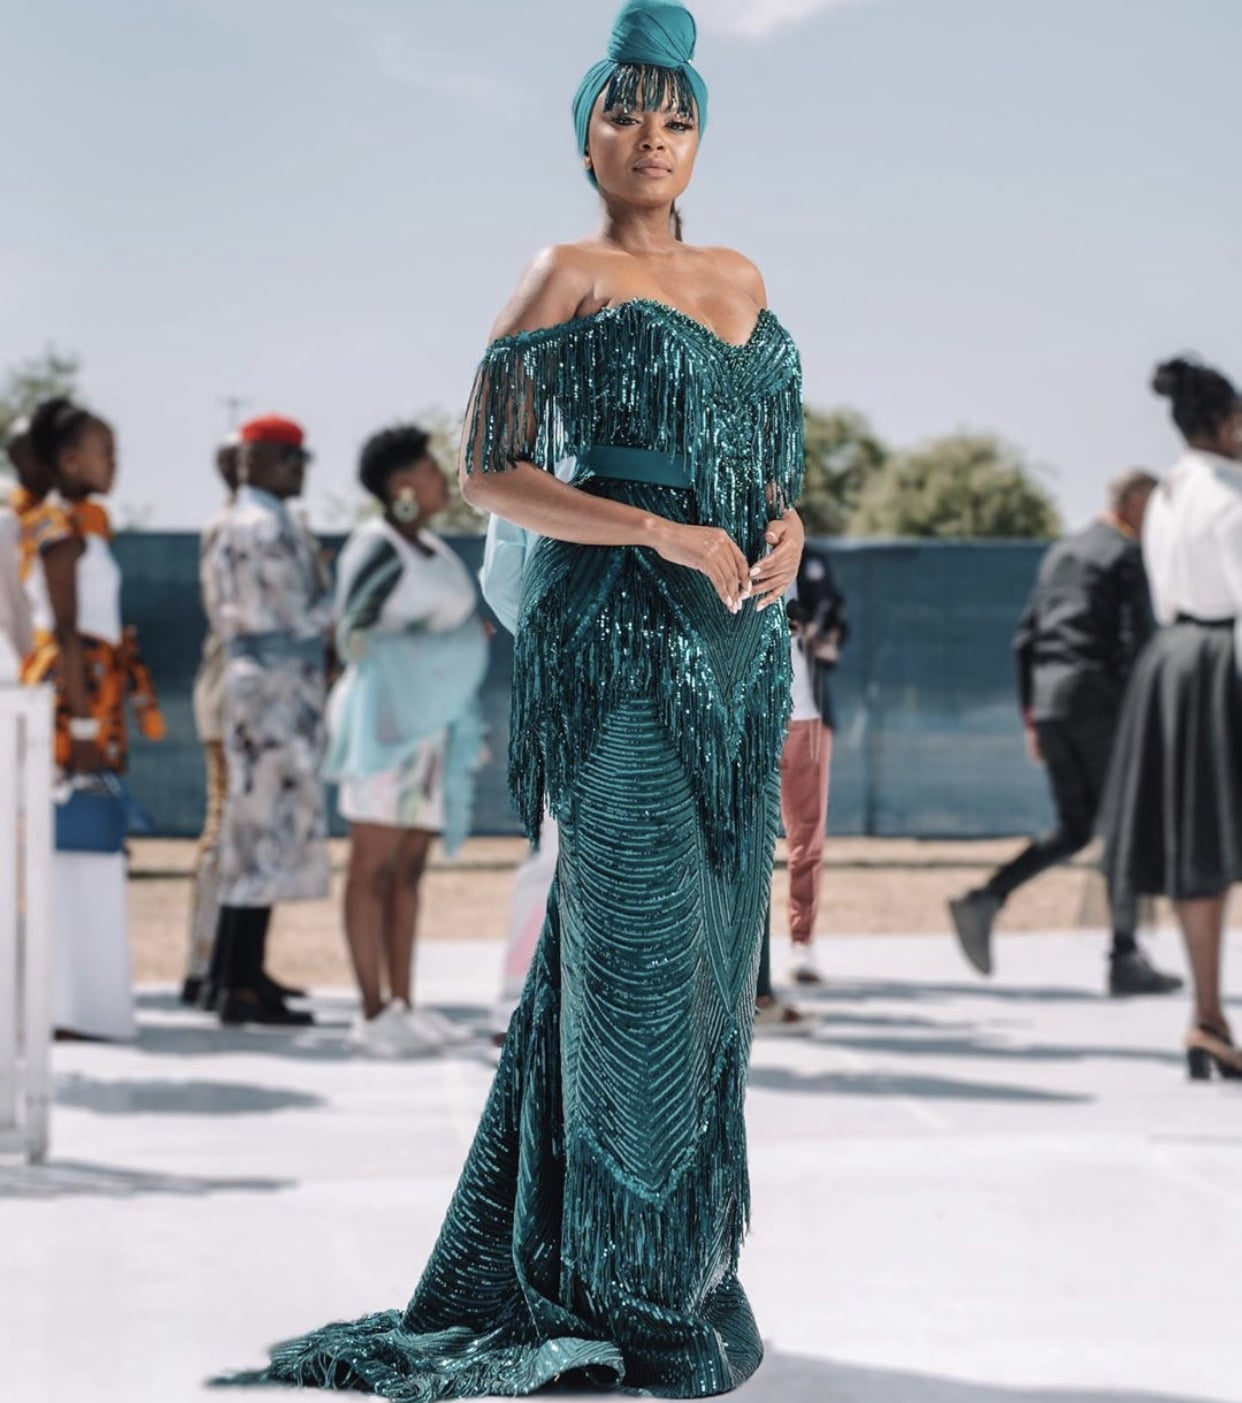 Lerato-kganyago-green-fringe-dress-african-celebs-style